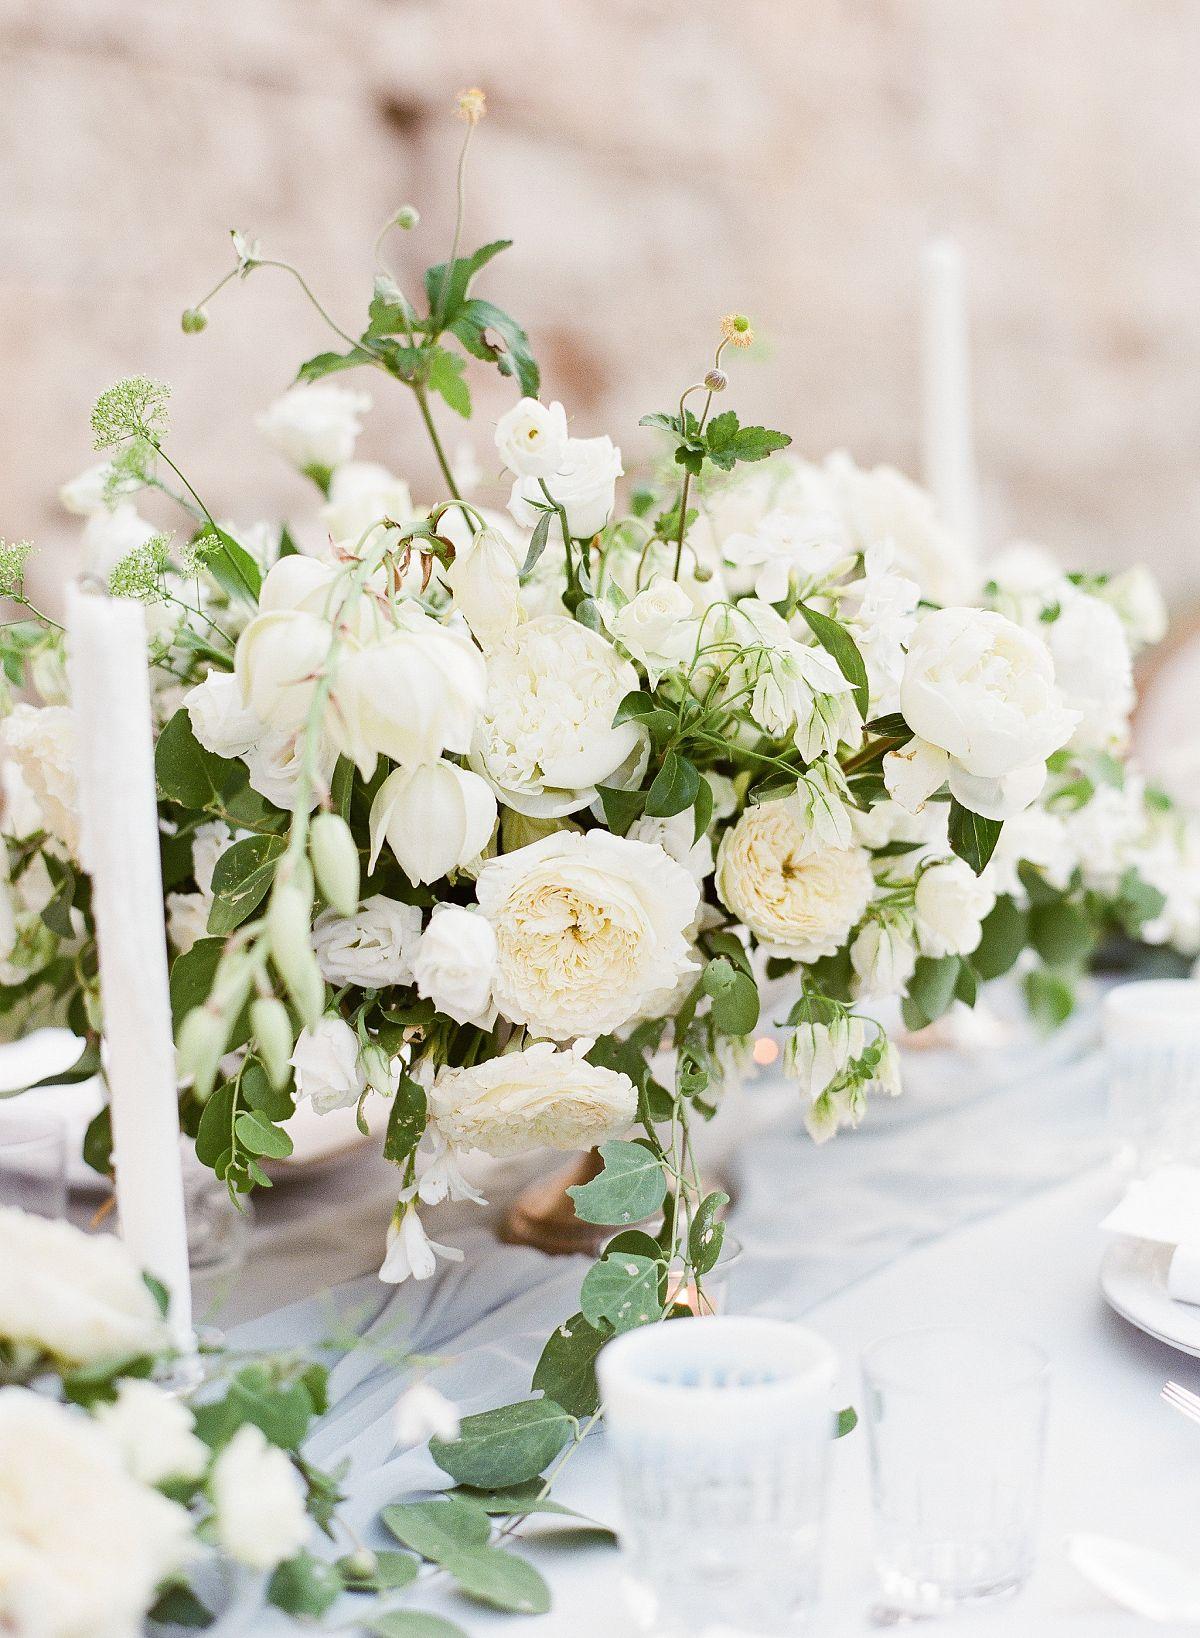 Destination Pre-Wedding Shoot Ideas in Greece by Marie Film ...